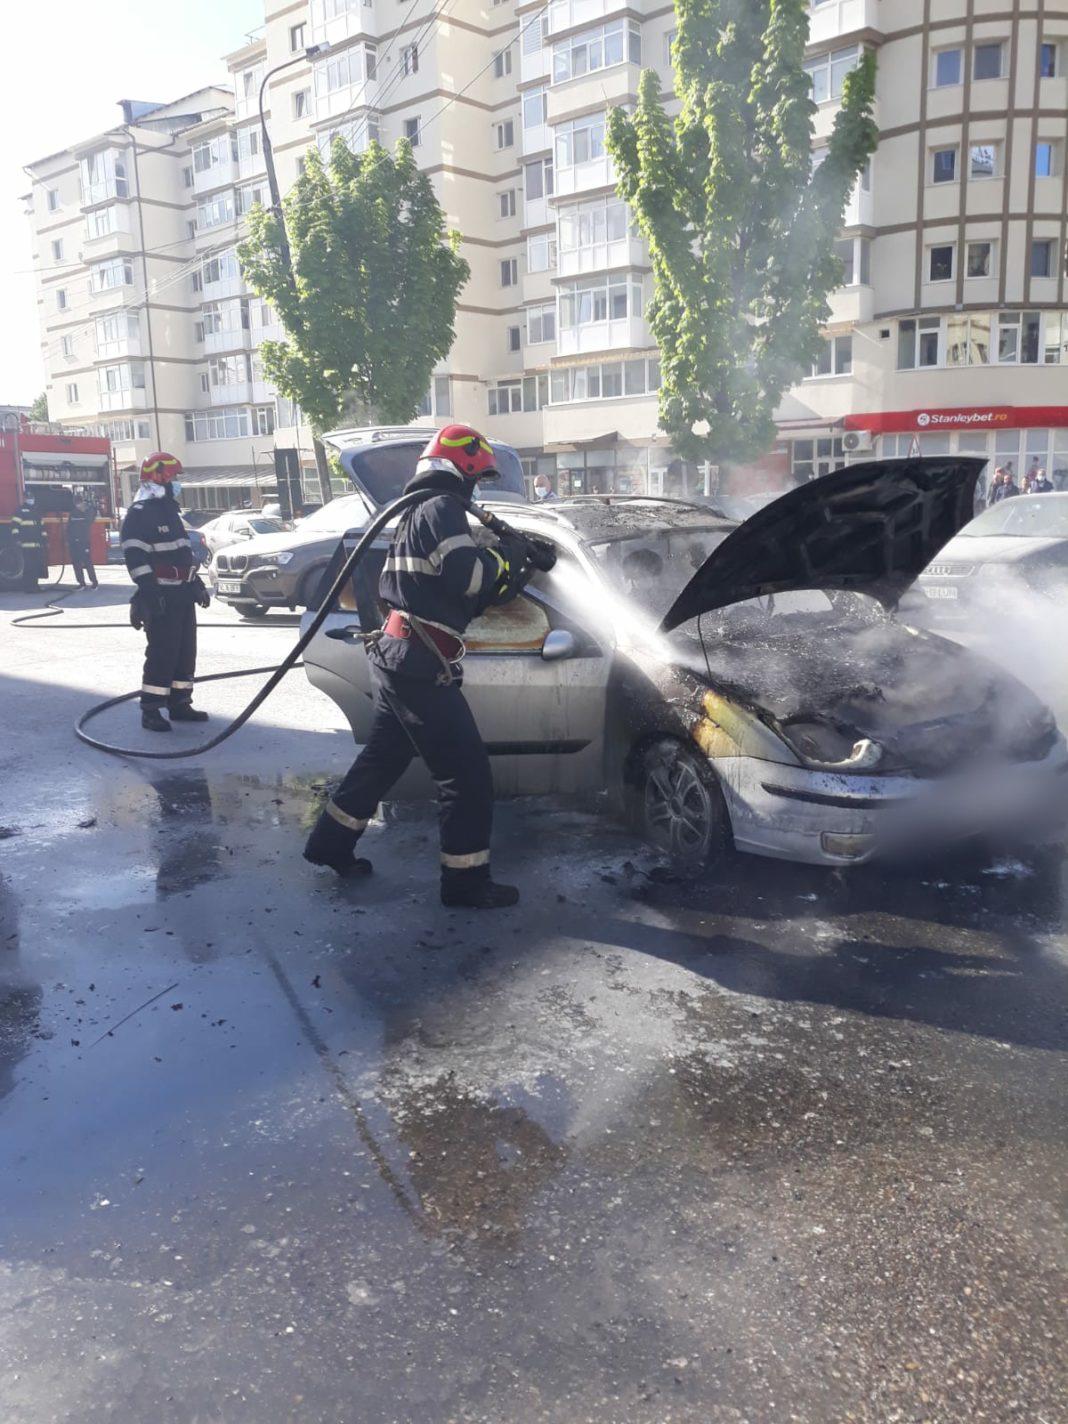 Autoturism stins de pompieri